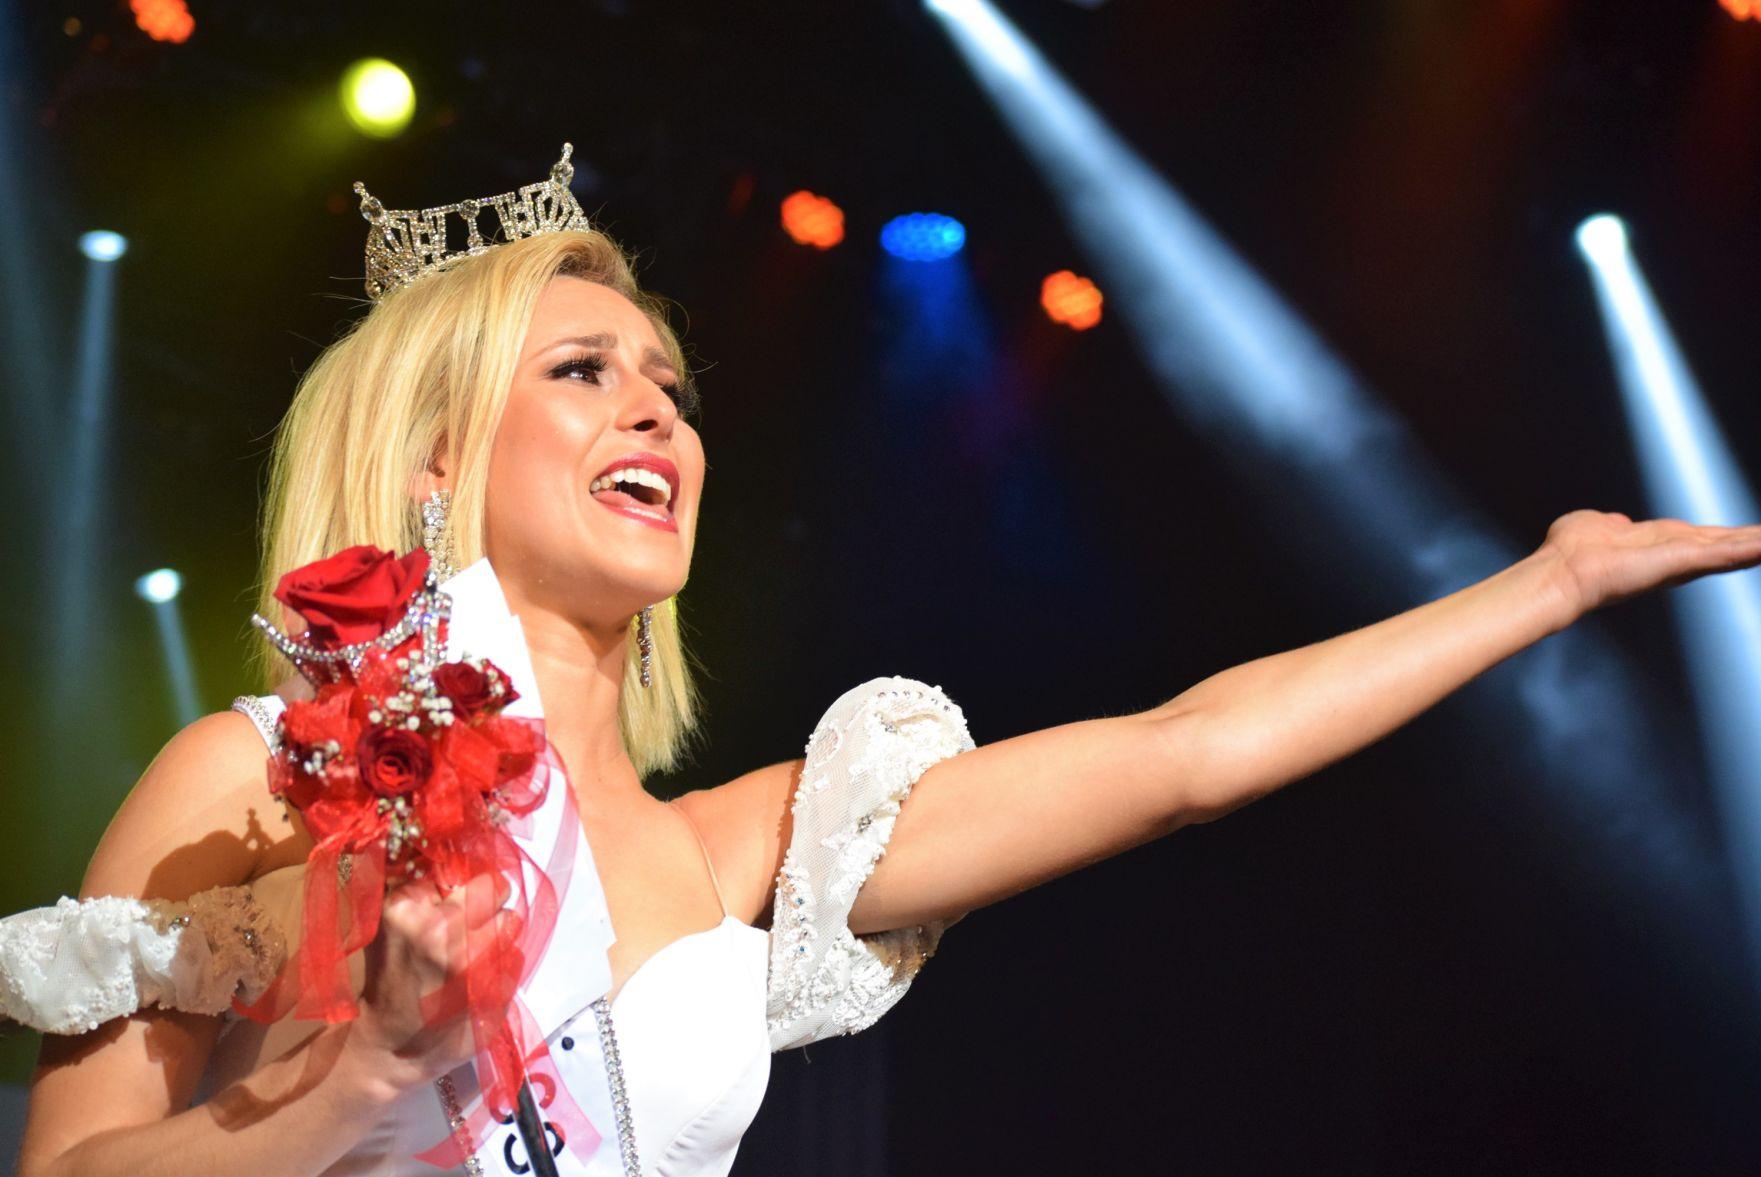 Cincinnati native claims Miss Ohio 2019 title